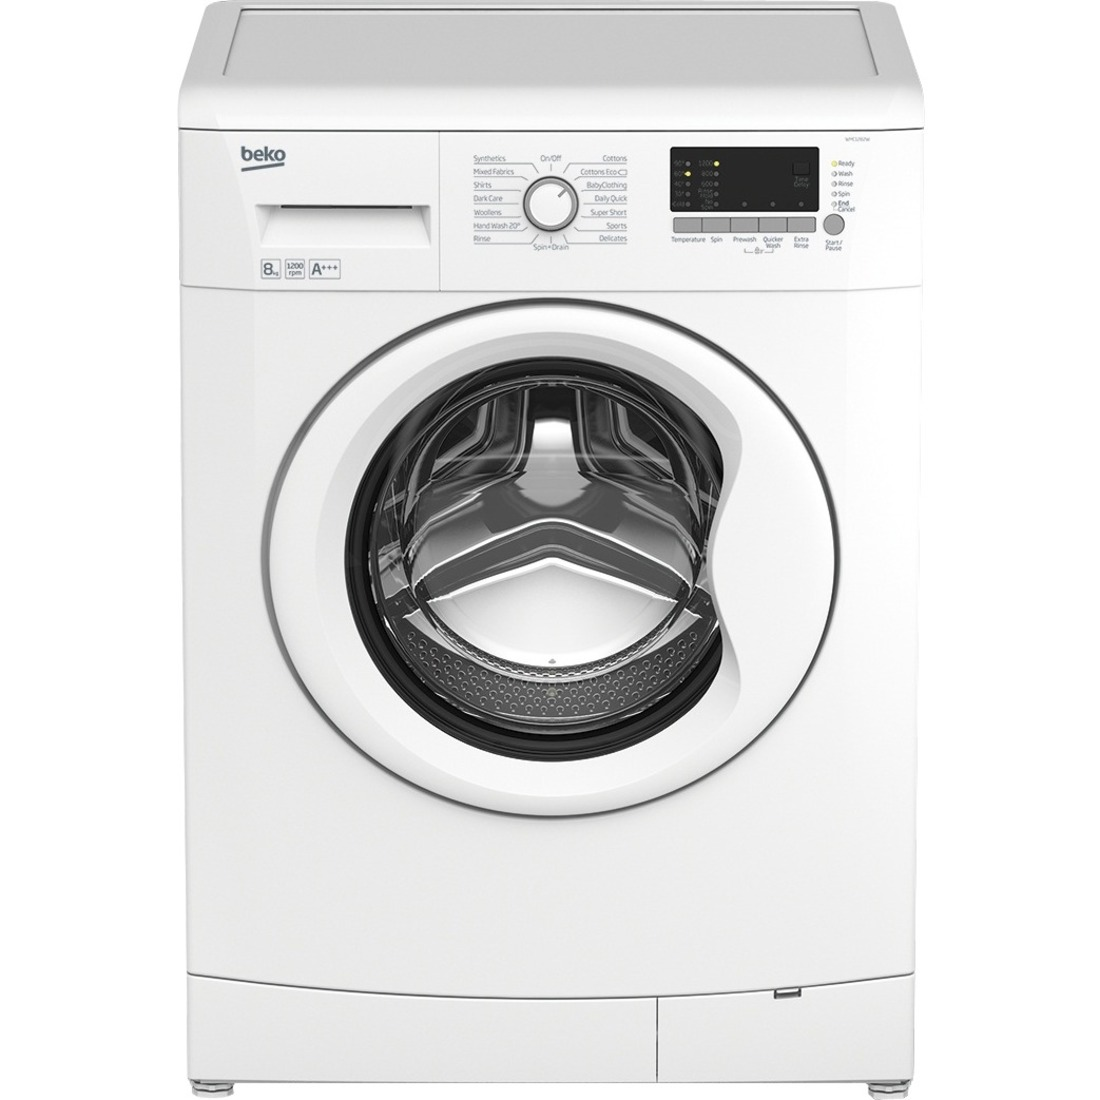 laundry washing machine reviews